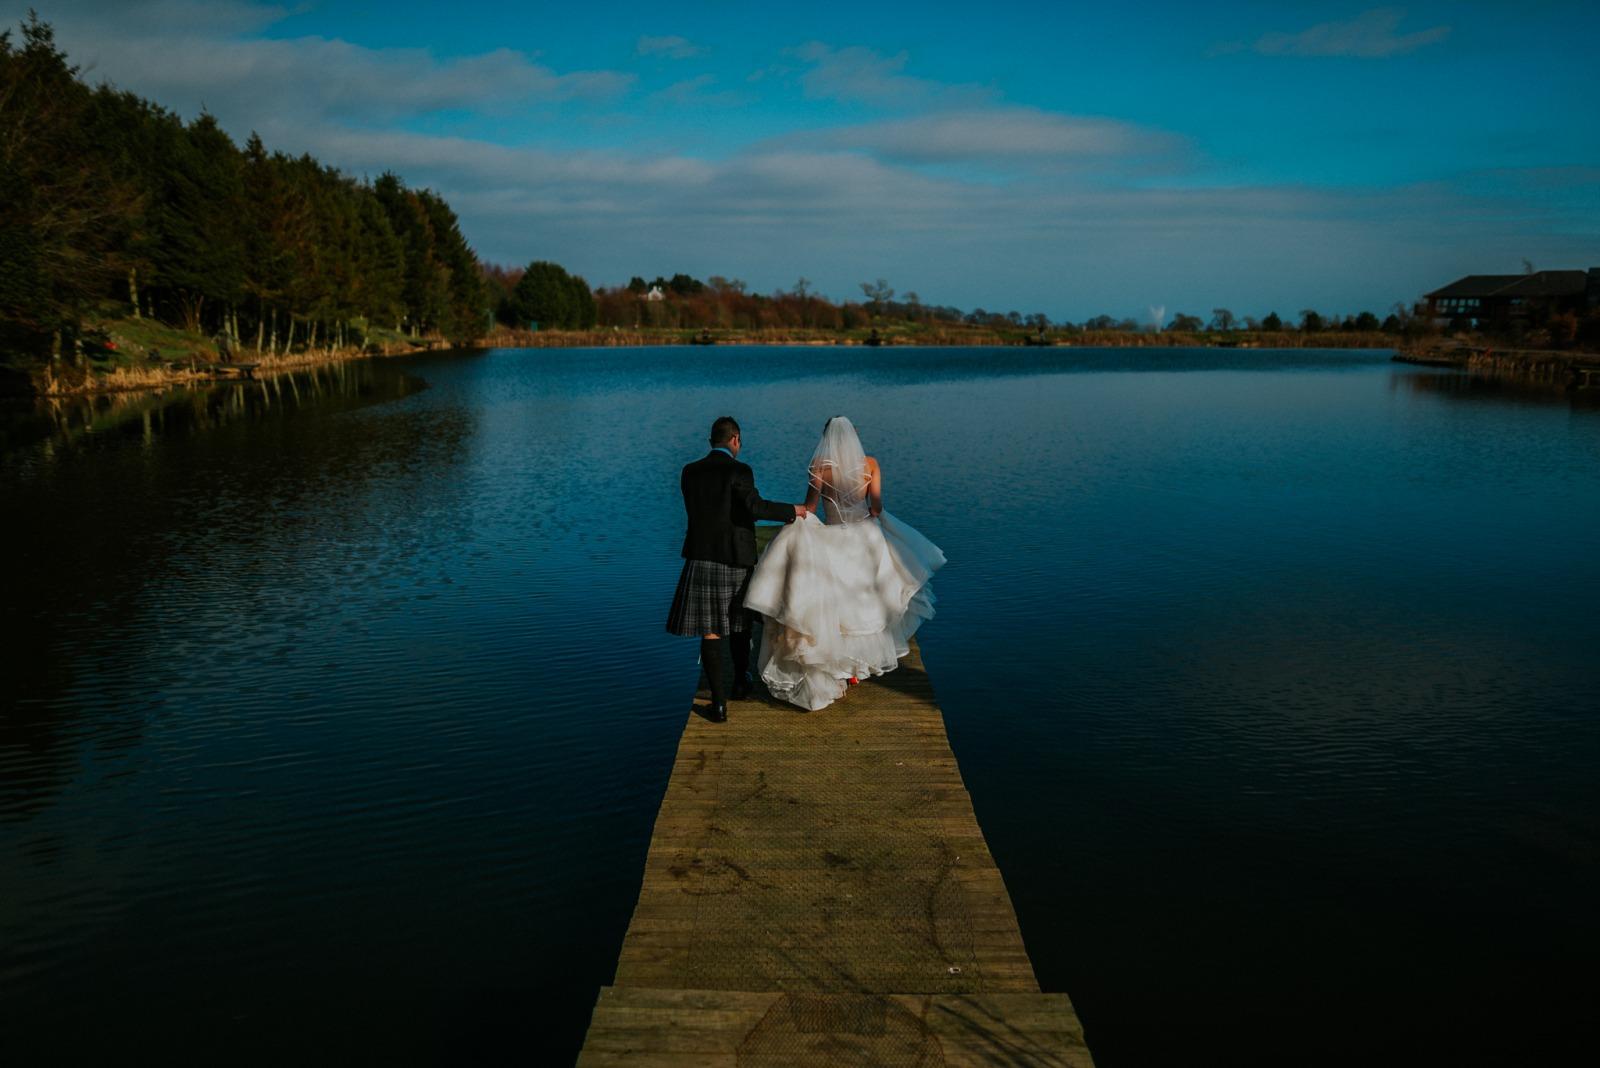 forbes-of-kingennie-wedding-295-of-504